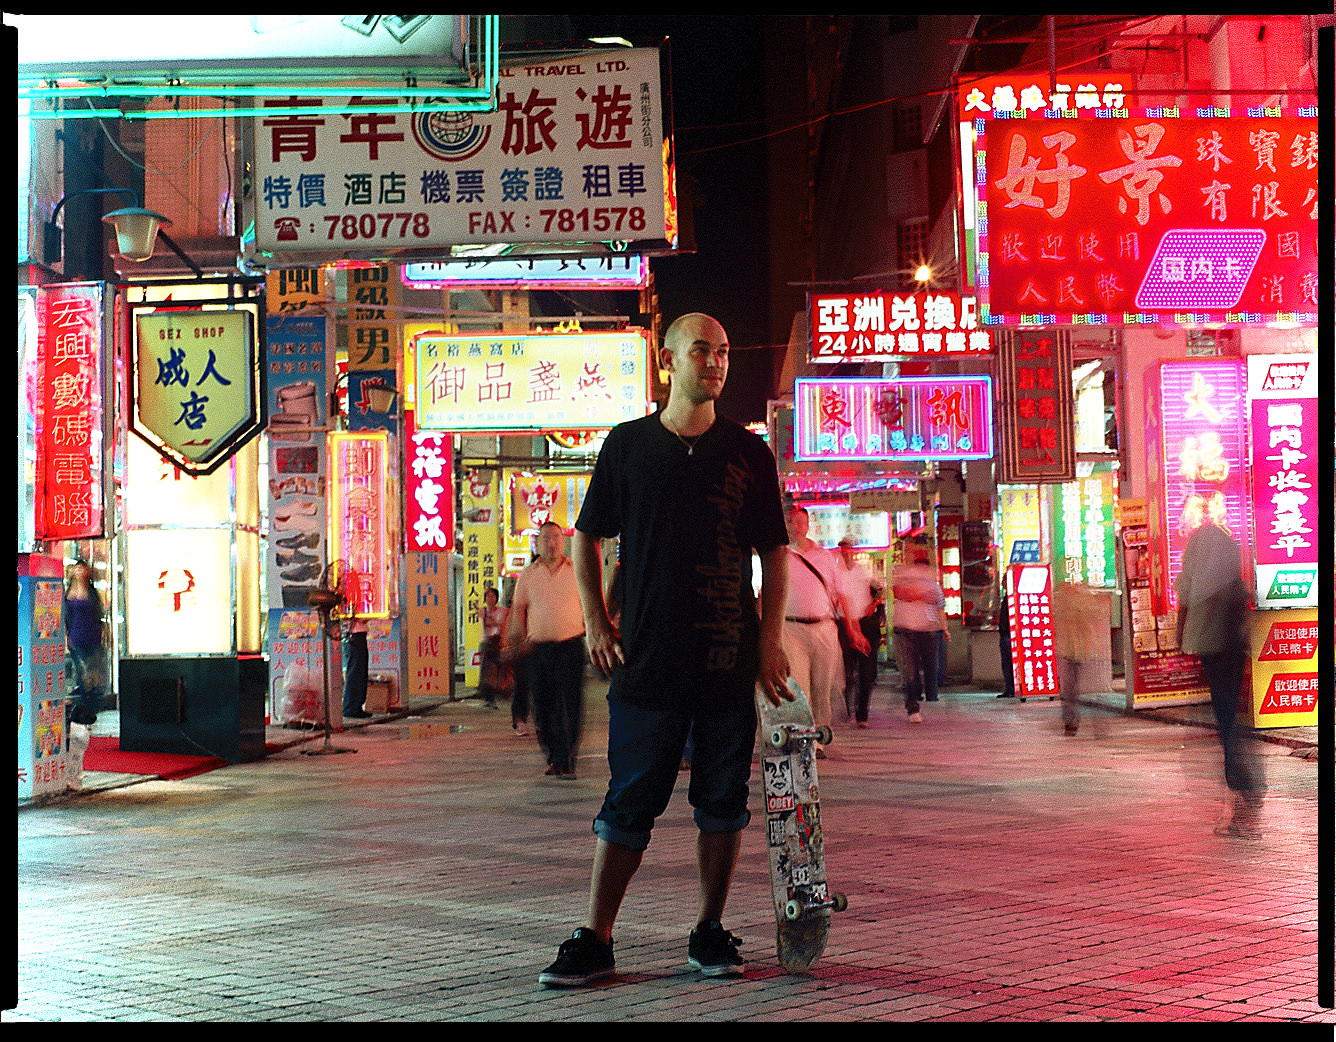 MediumFormatPatrikWallner_Macau_MacauLostGerardLOWQ